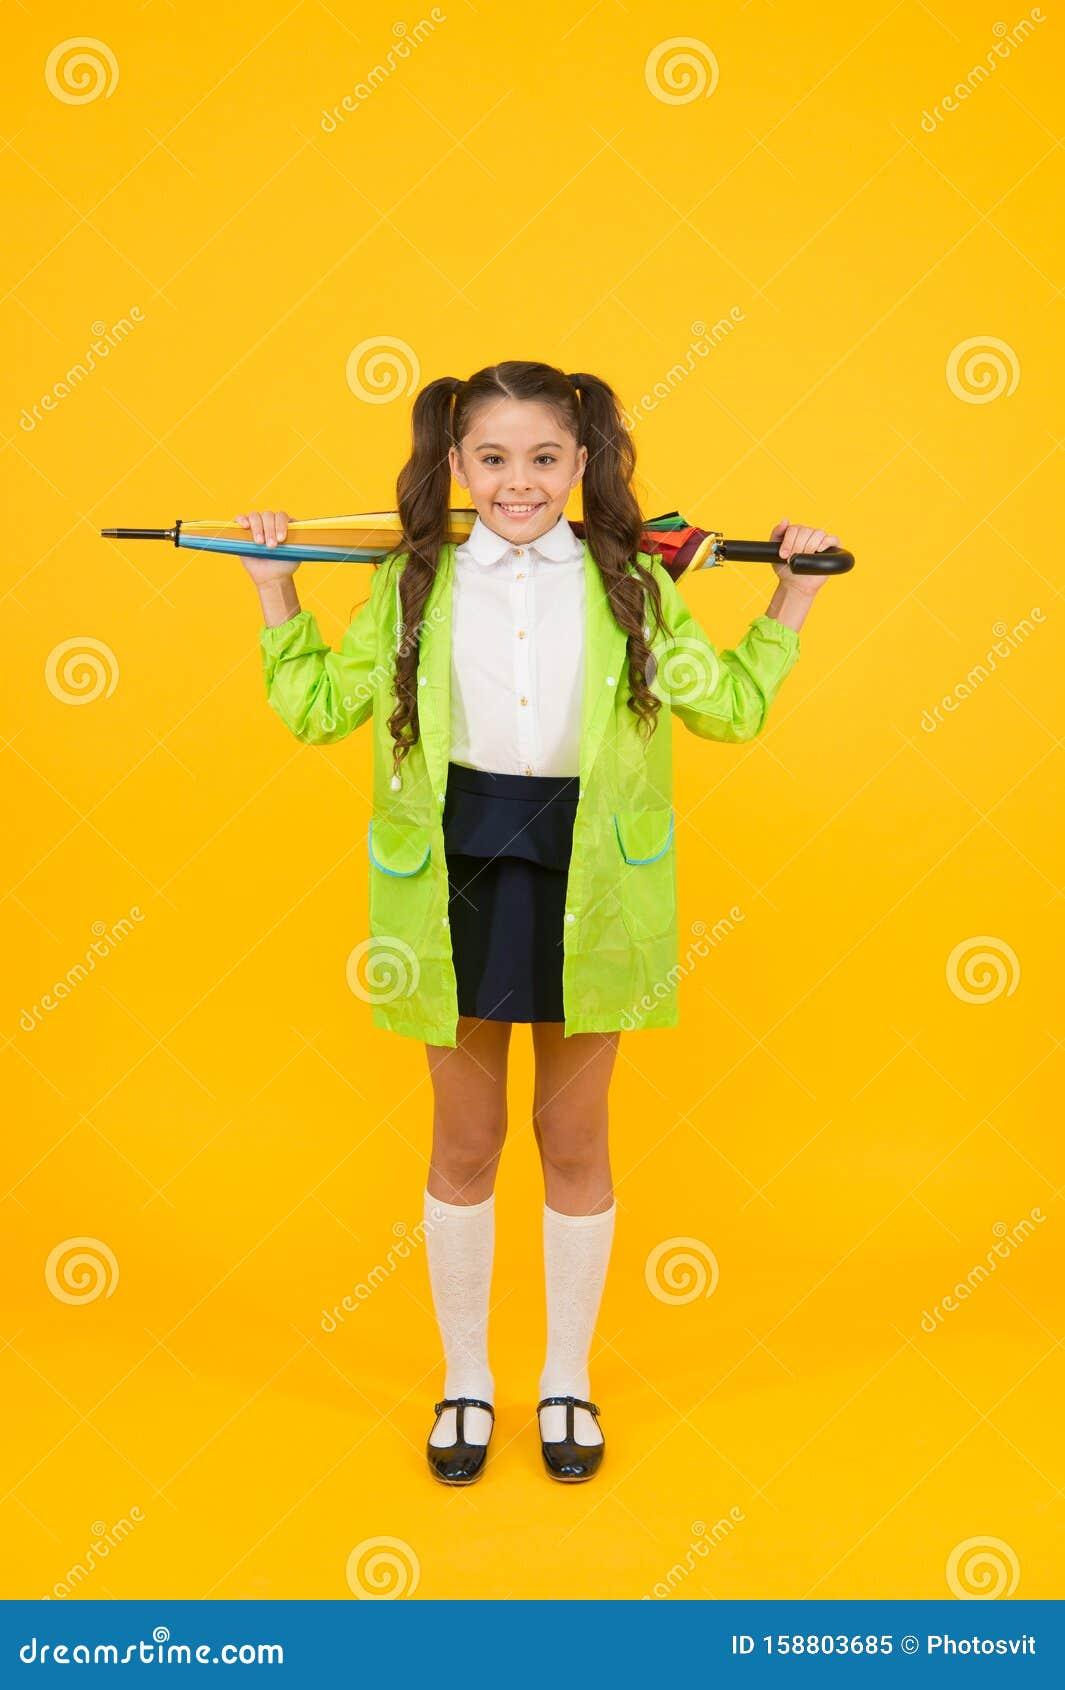 Waiting For Rainy Days. Schoolgirl Stylish Little Kid With